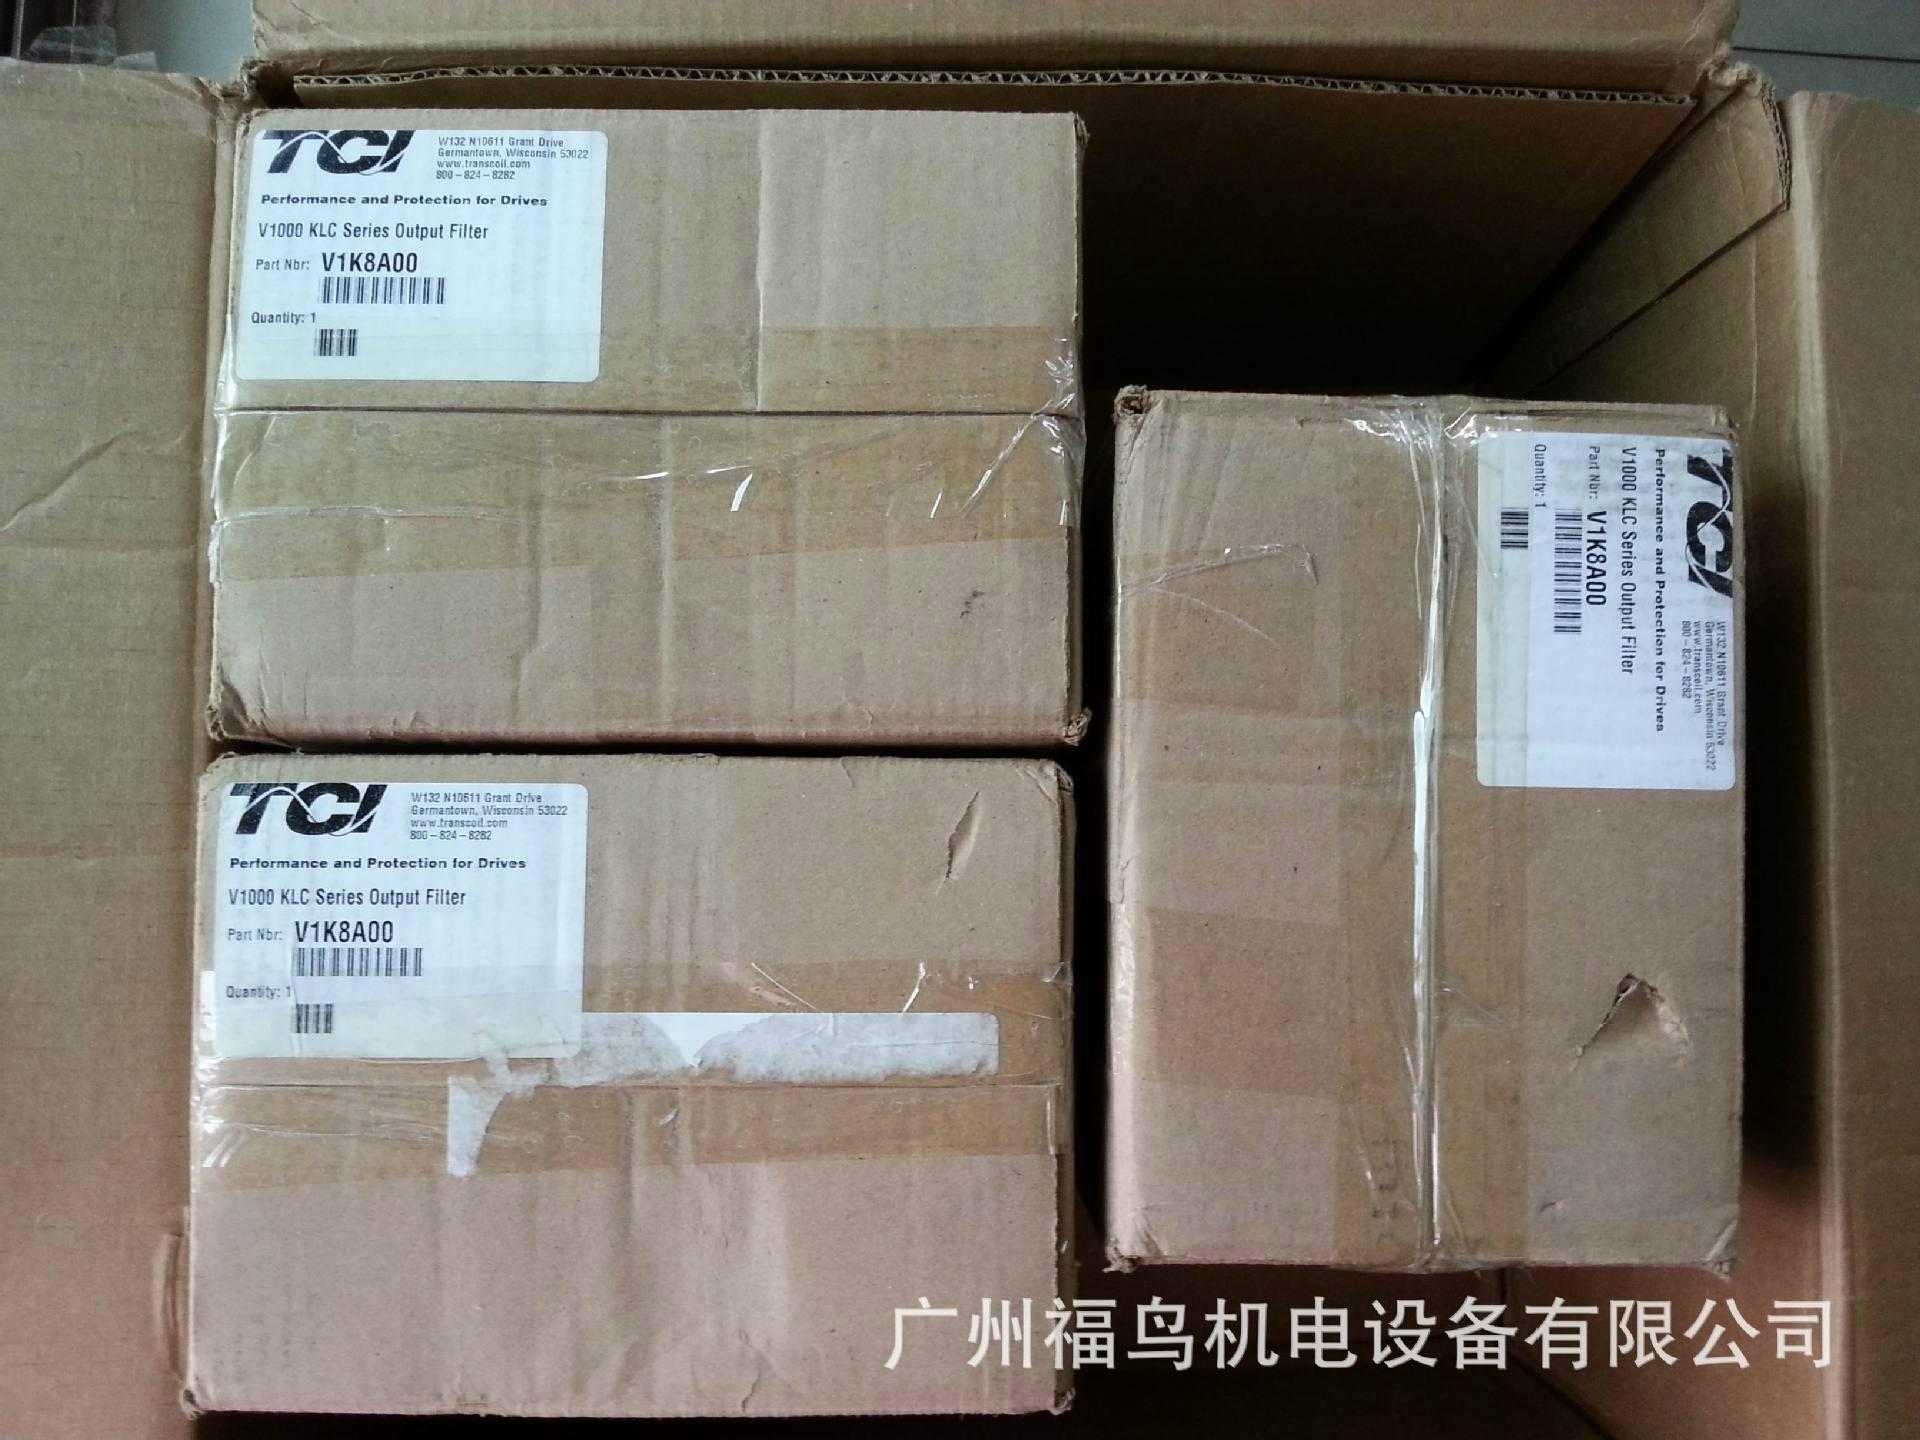 TCI电源滤波器, 型号: V1K8A00